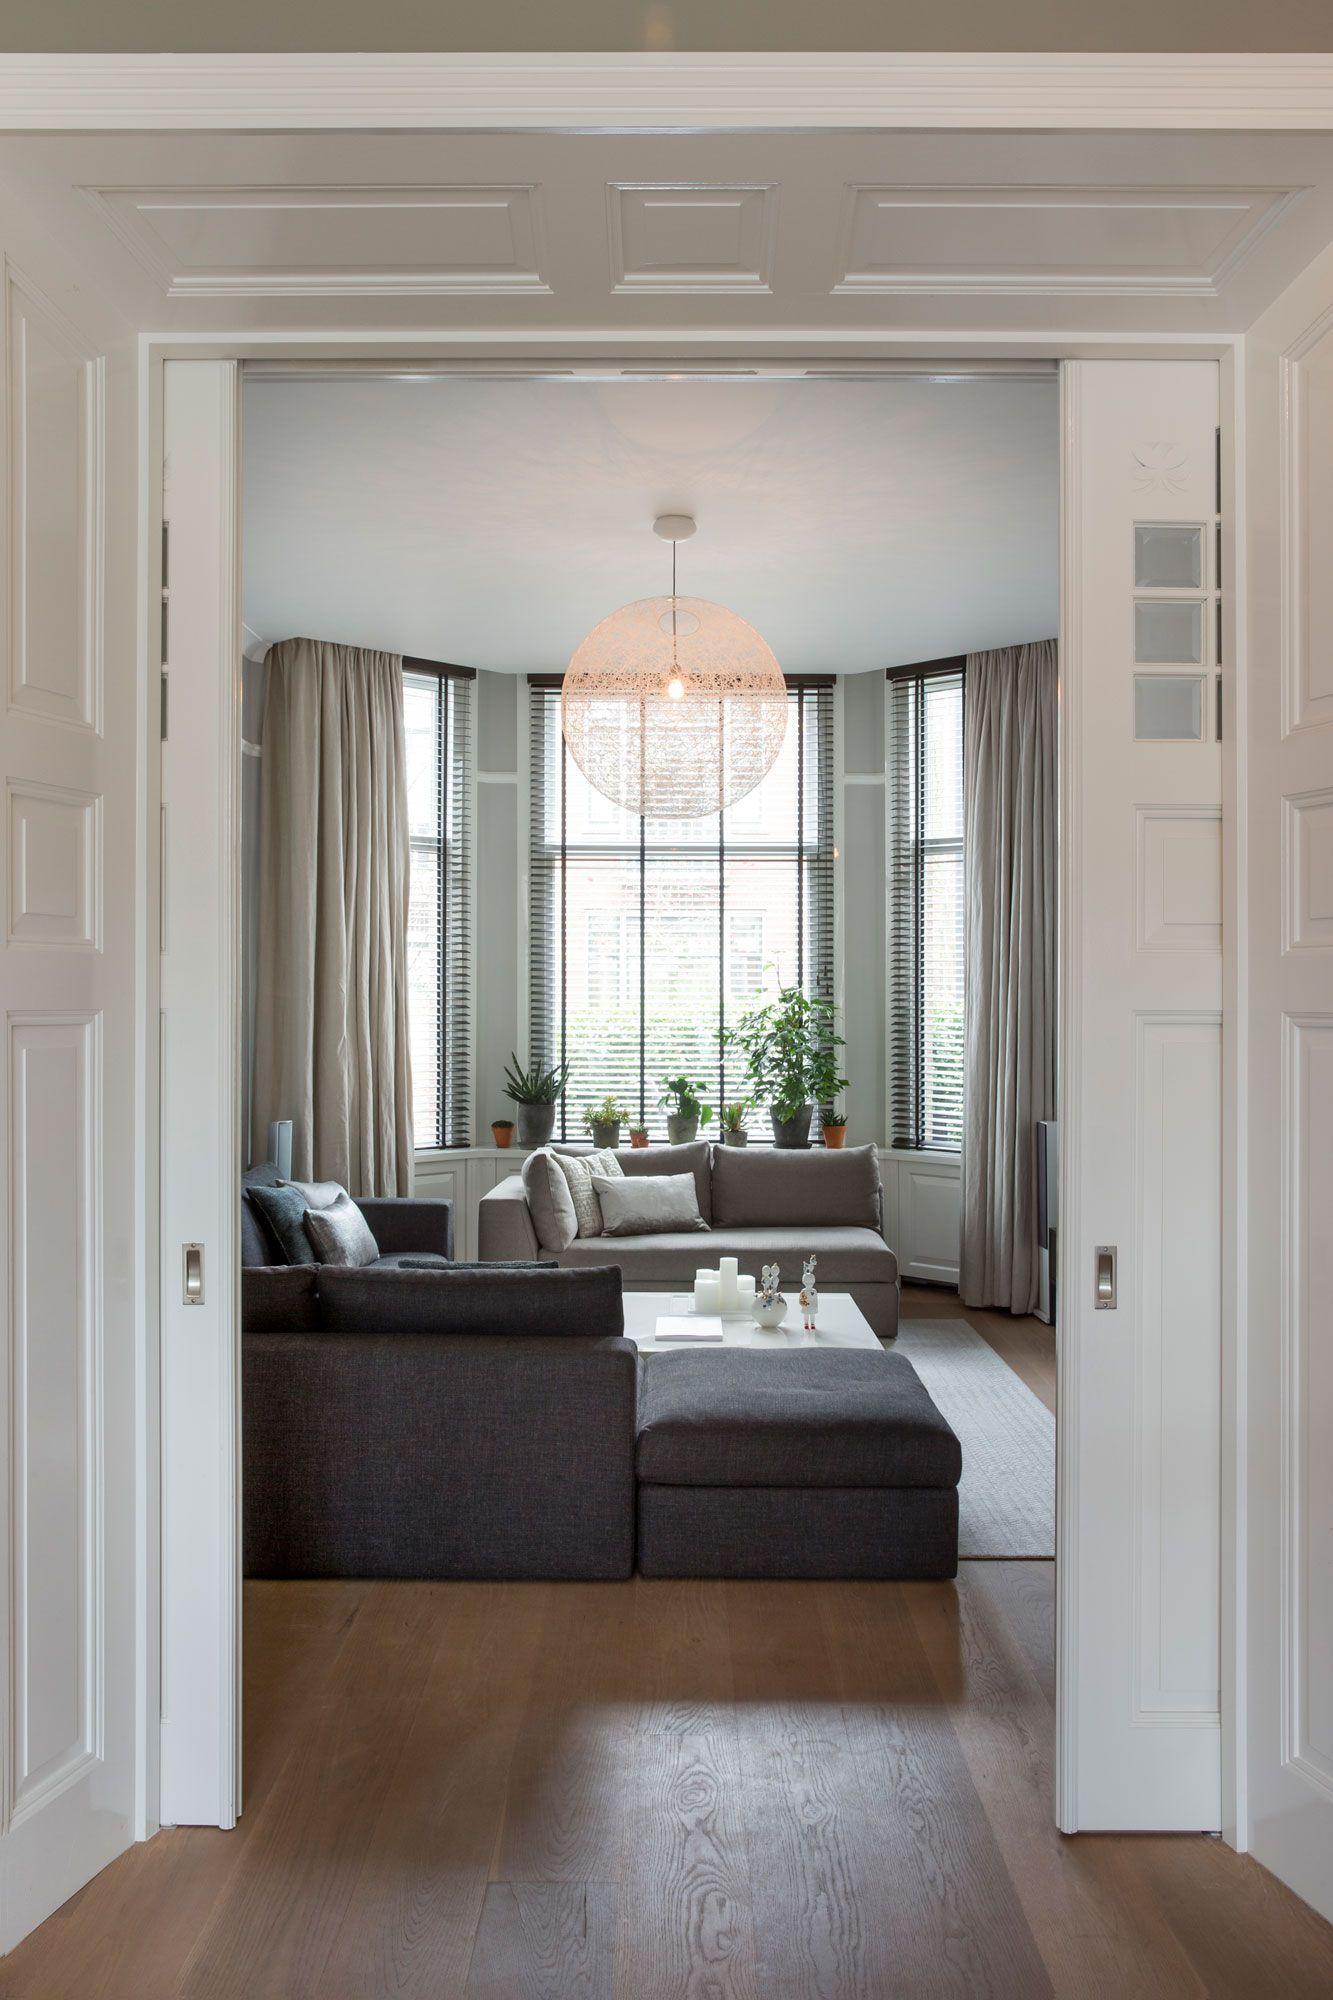 Foto's van een Modern Woonkamer: woonkamer in warme tinten ...